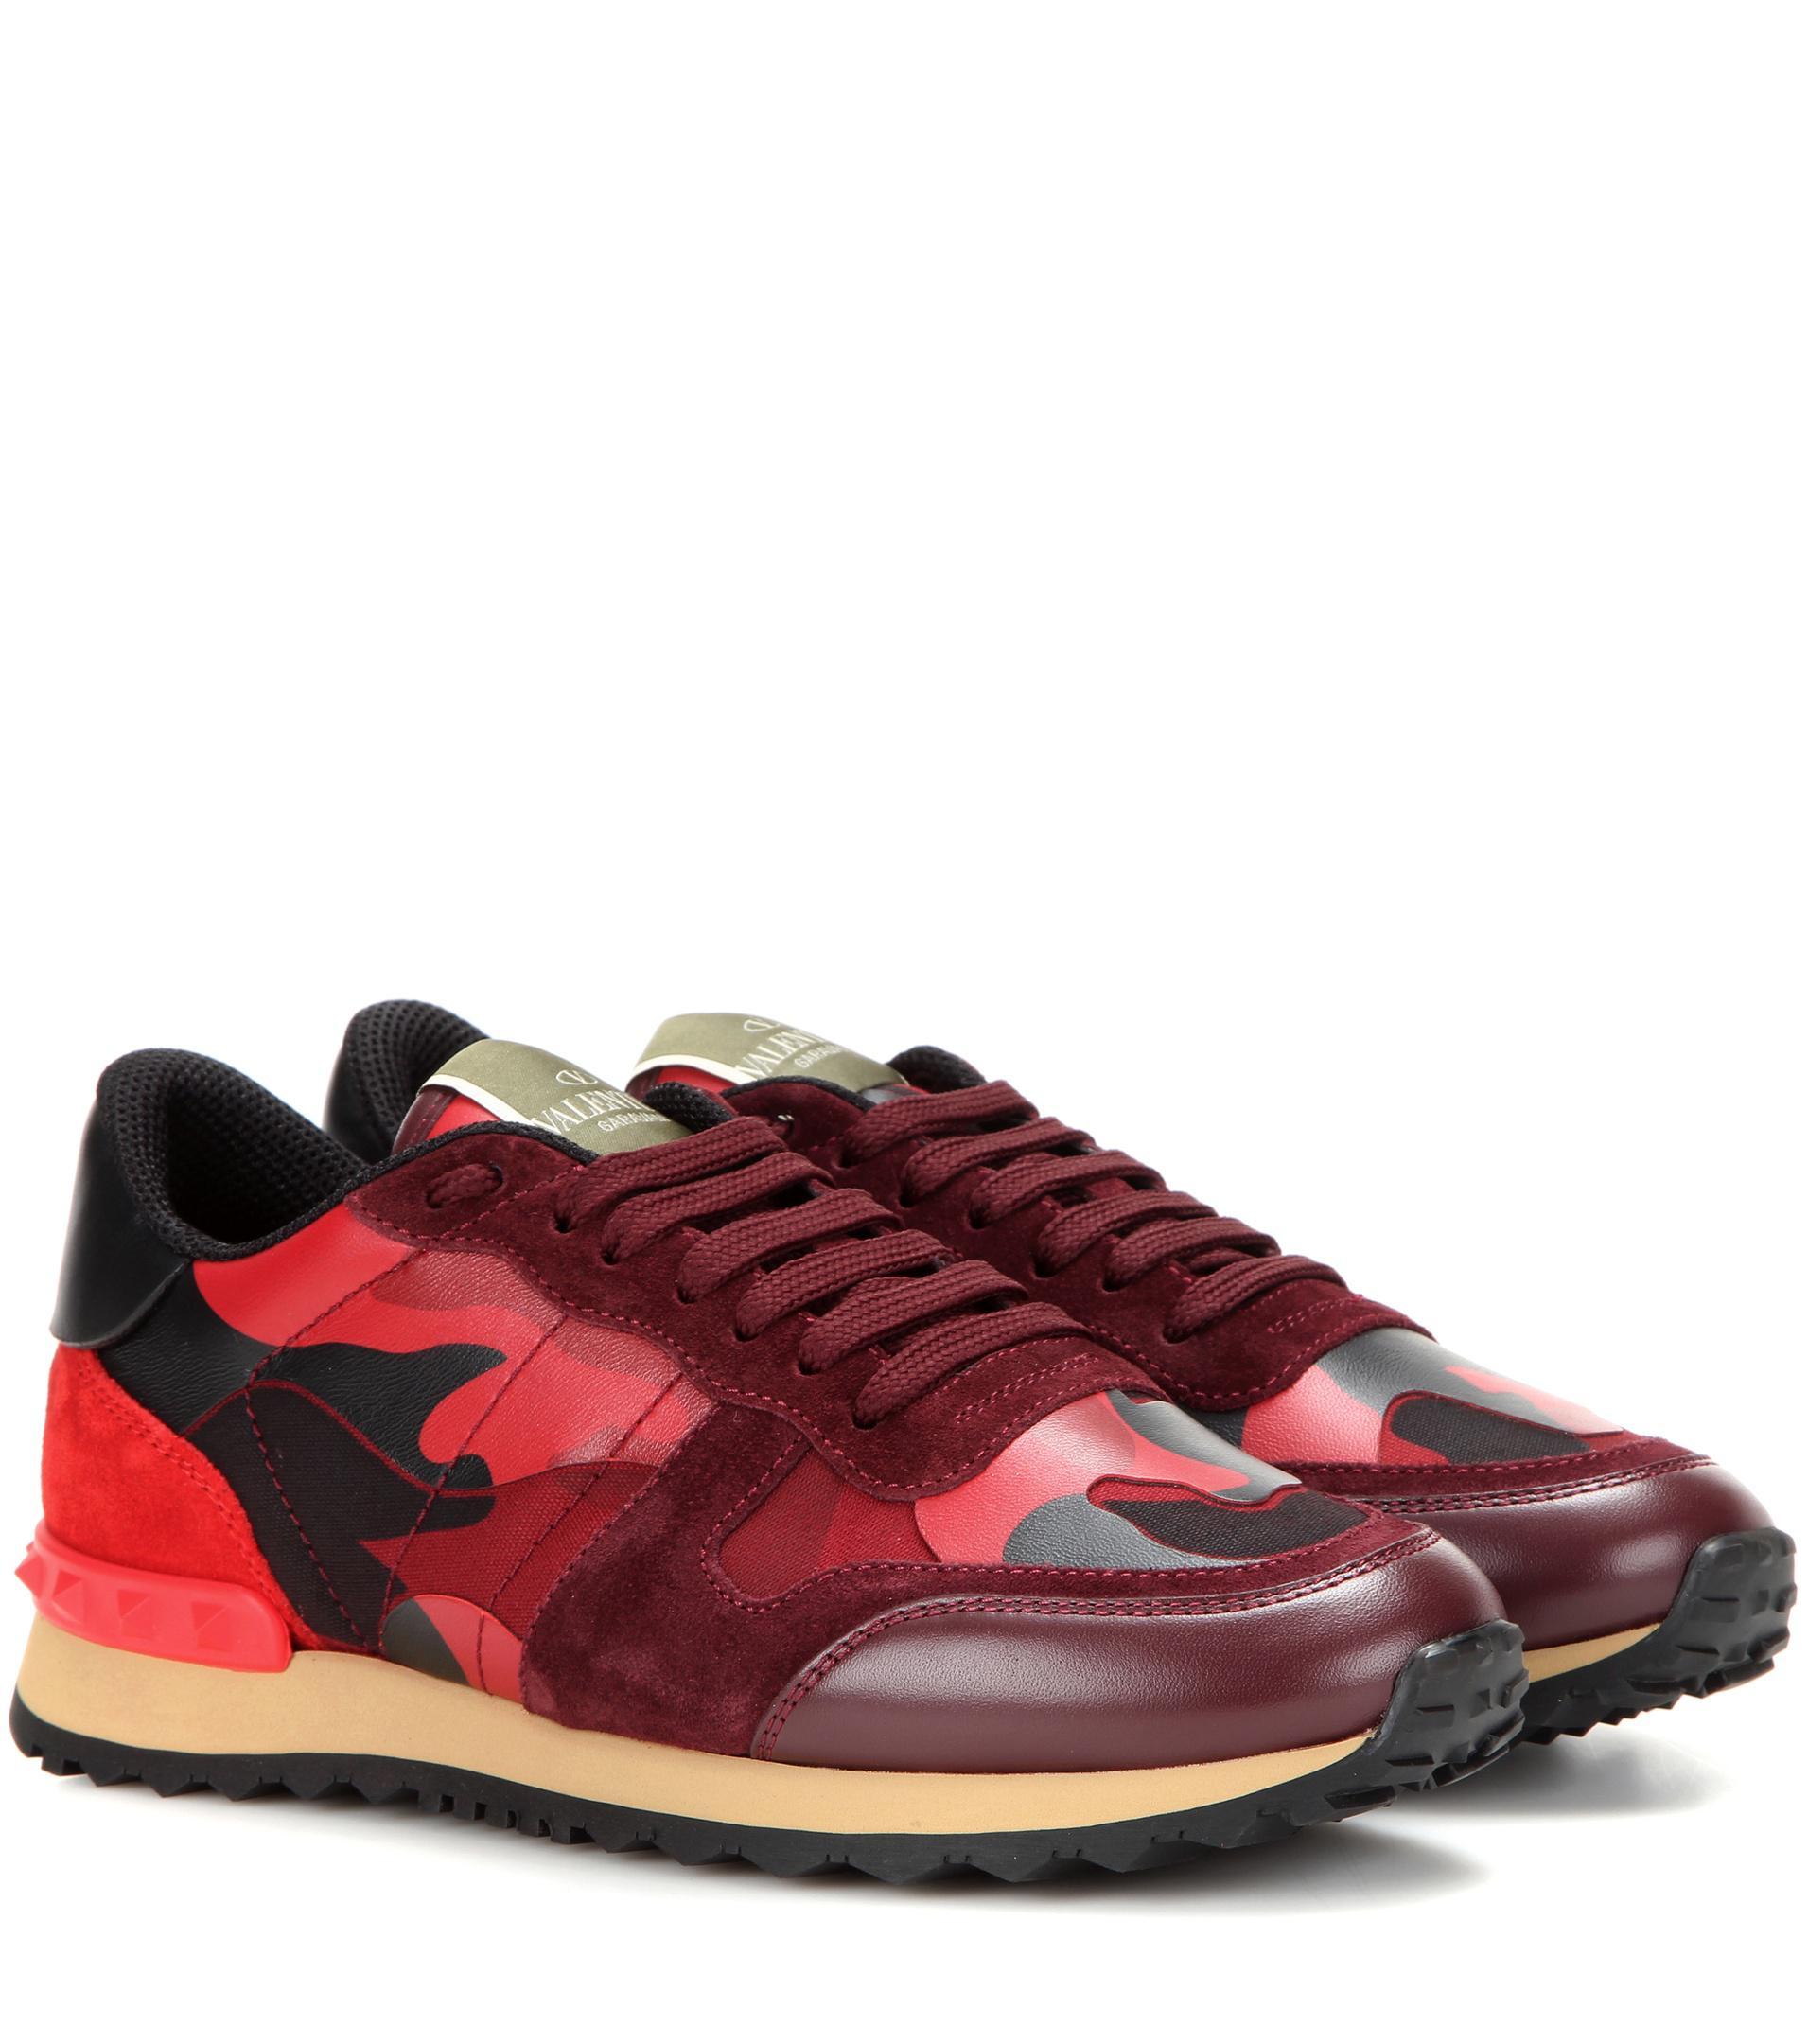 lyst valentino garavani rockrunner leather sneakers in red save 3. Black Bedroom Furniture Sets. Home Design Ideas